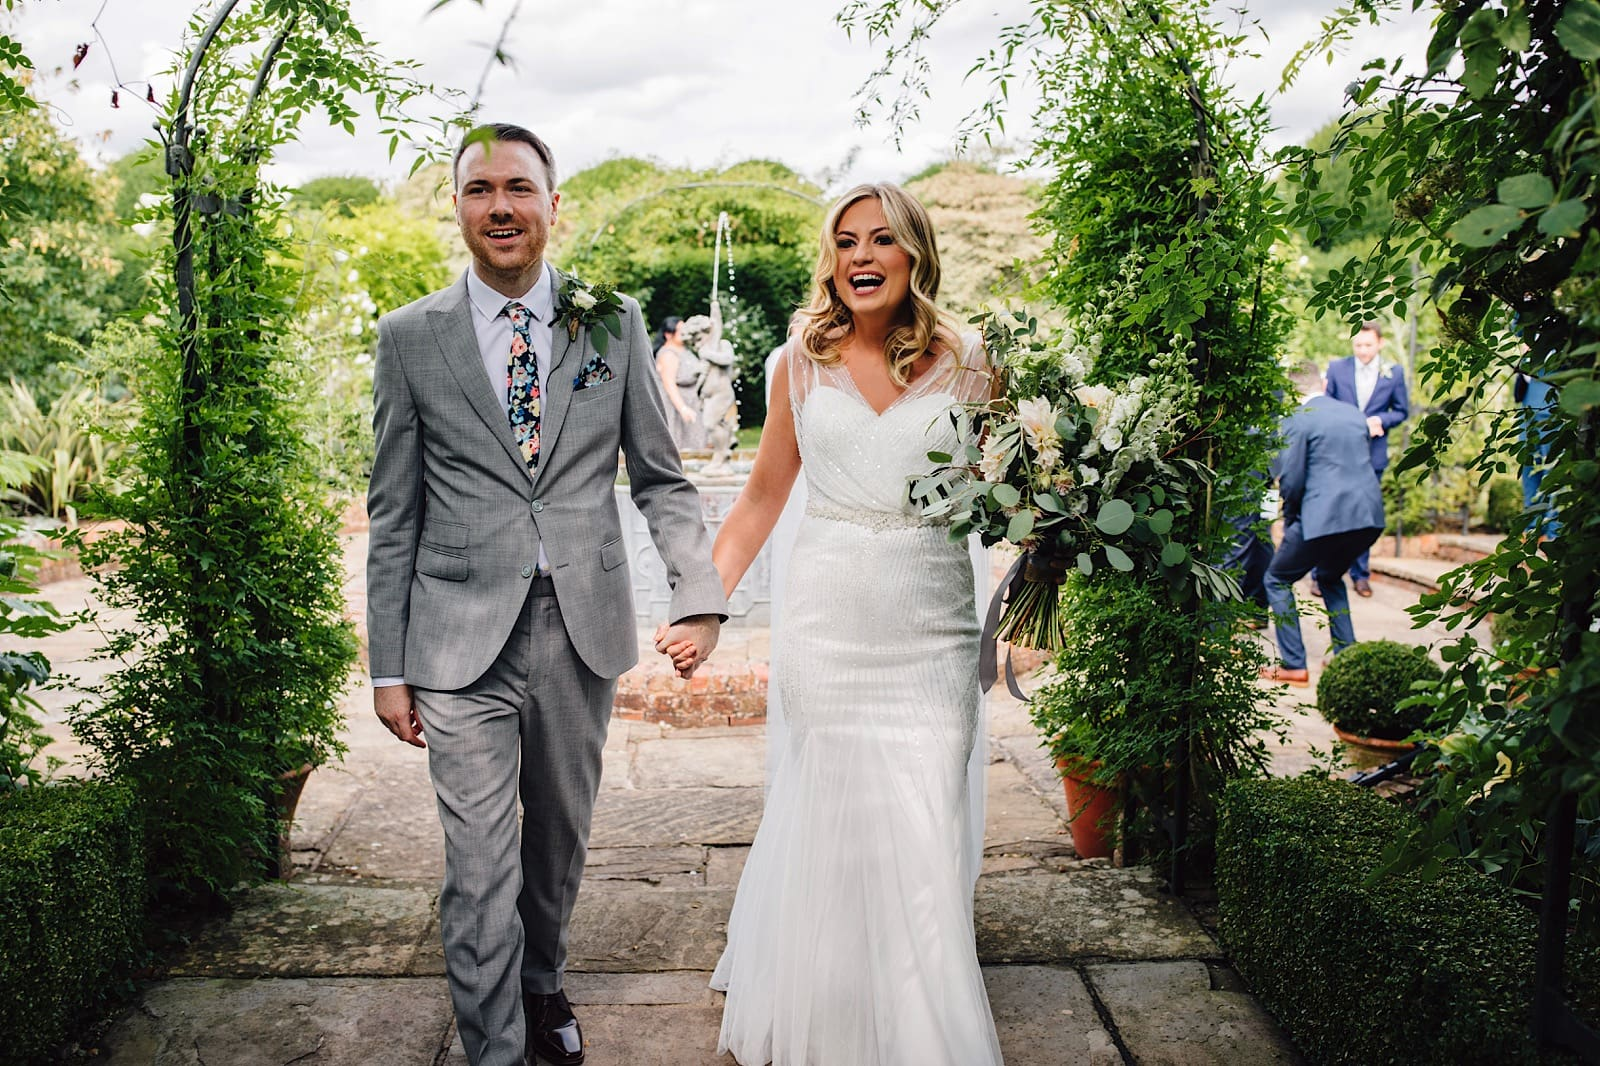 birtsmorton court wedding photography 0026